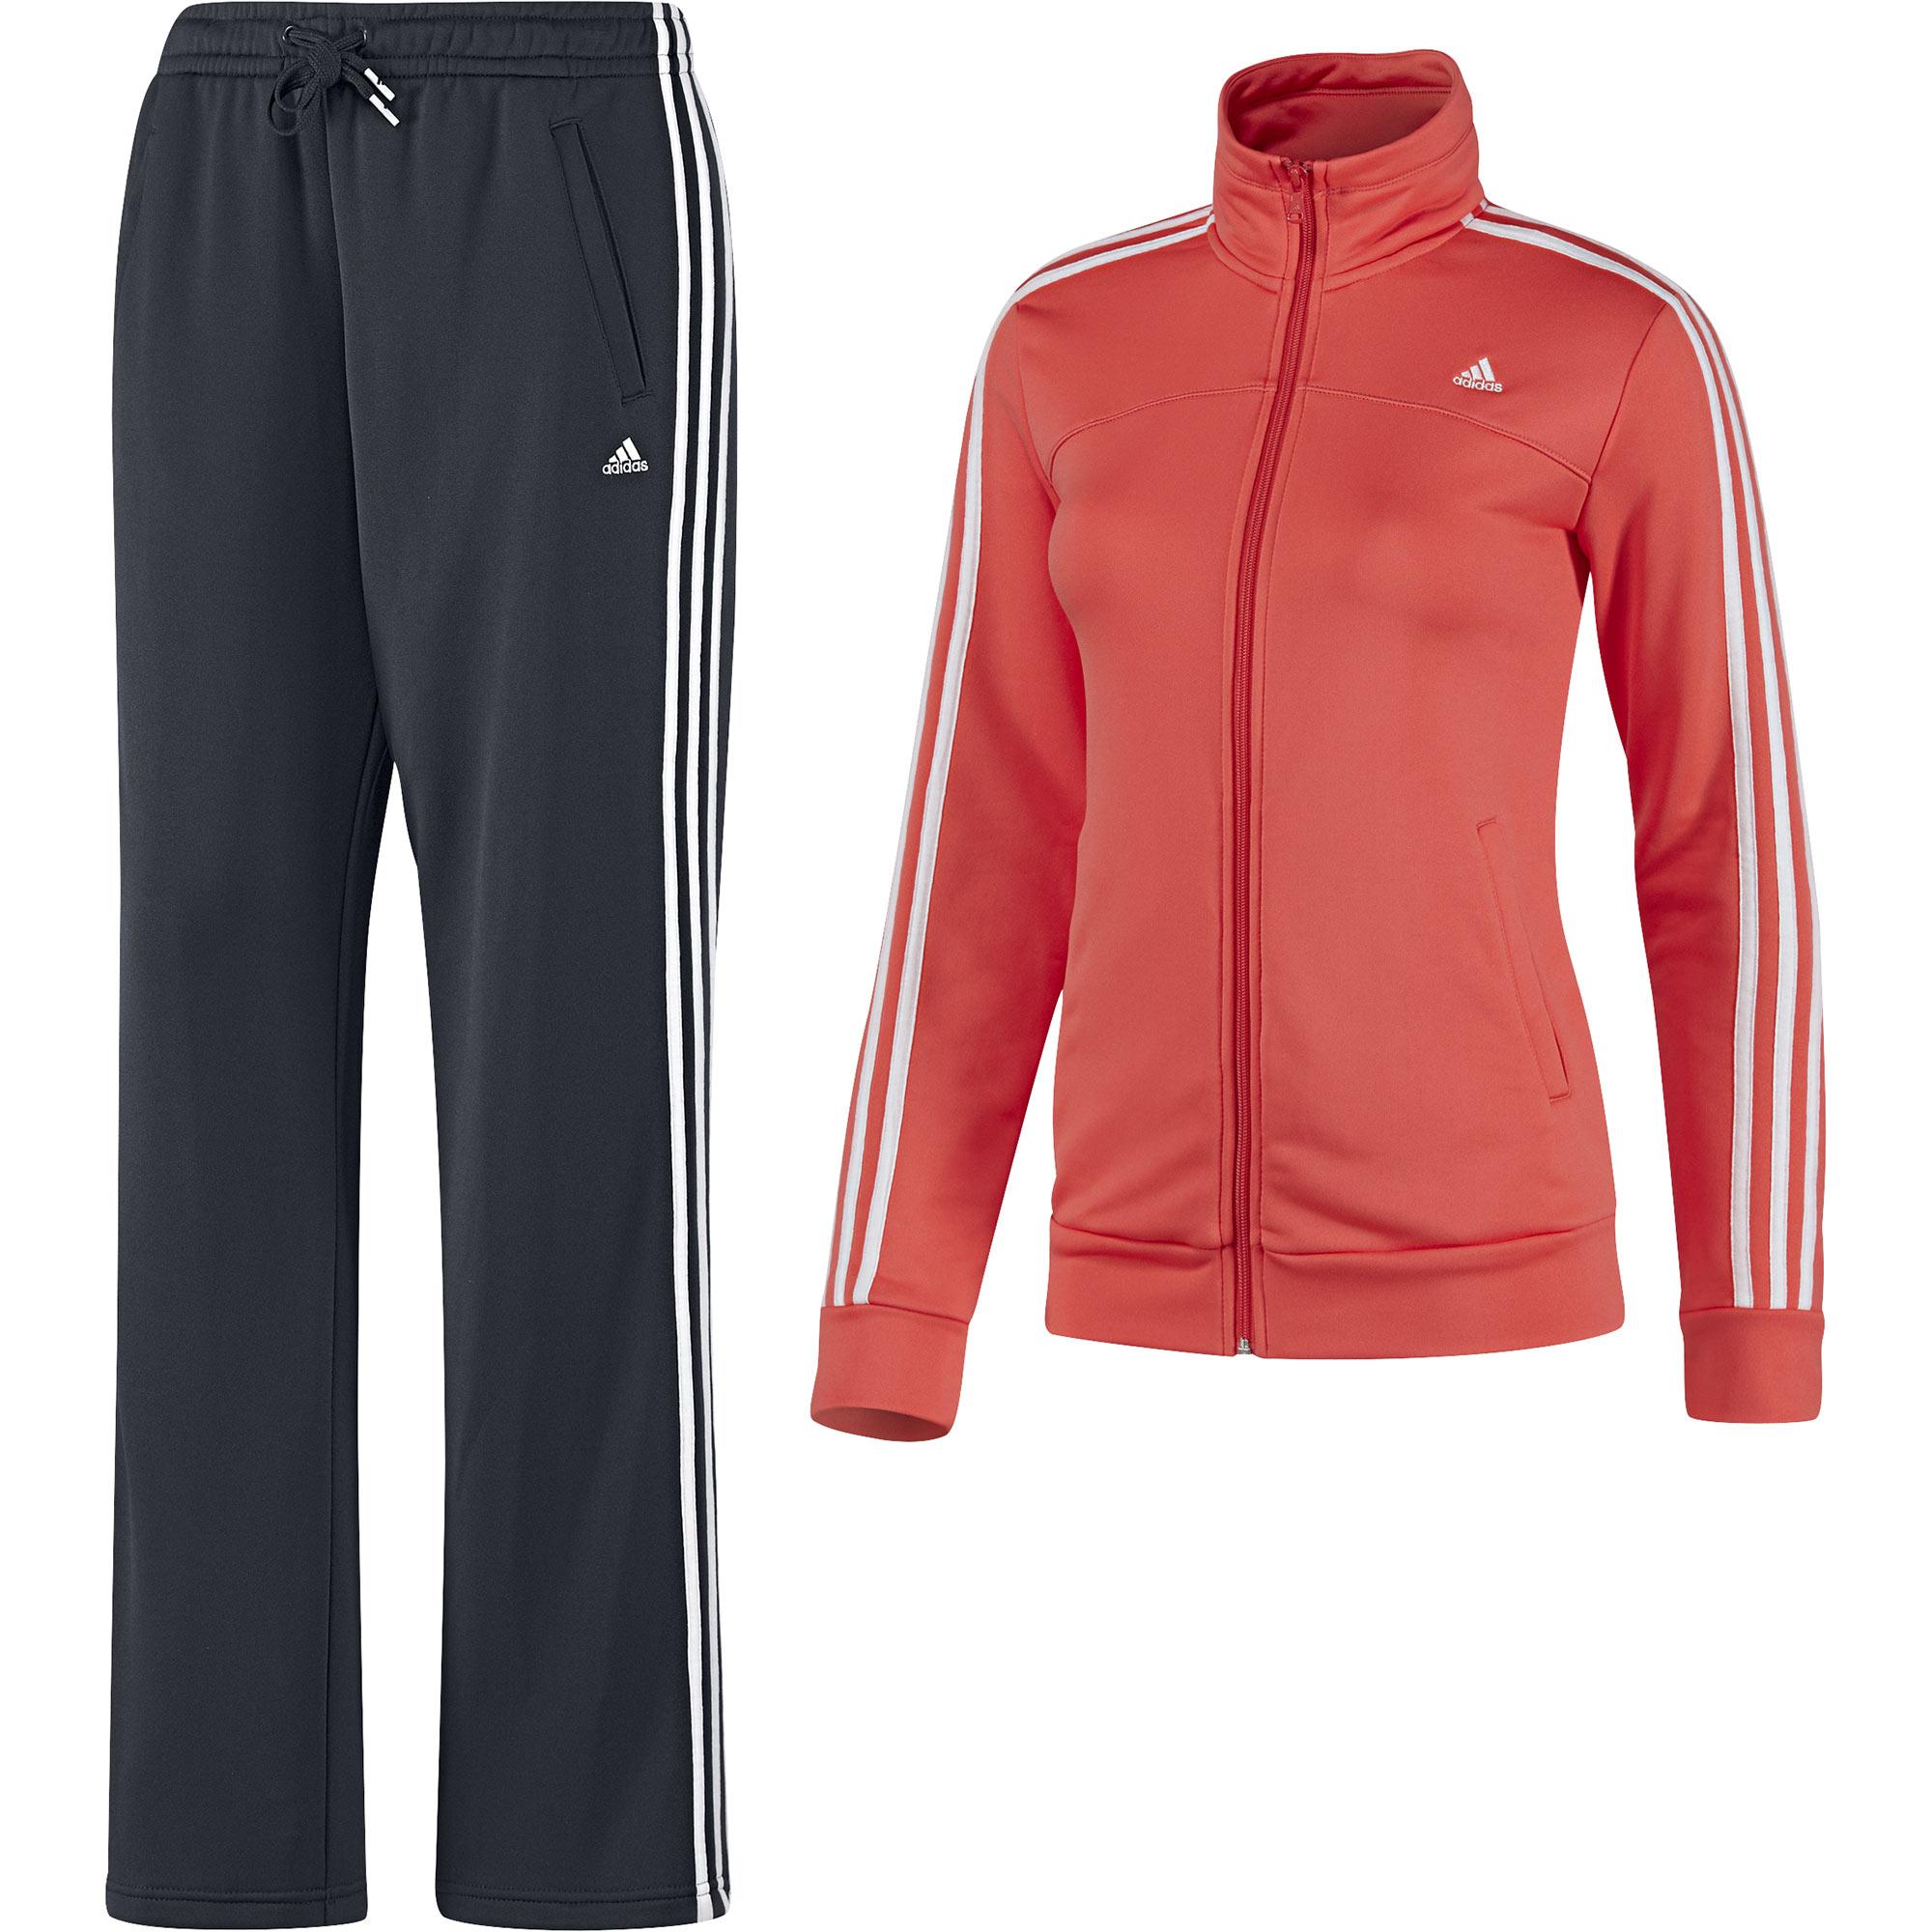 adidas damen trainingsanzug 3s young knit suit climalite. Black Bedroom Furniture Sets. Home Design Ideas